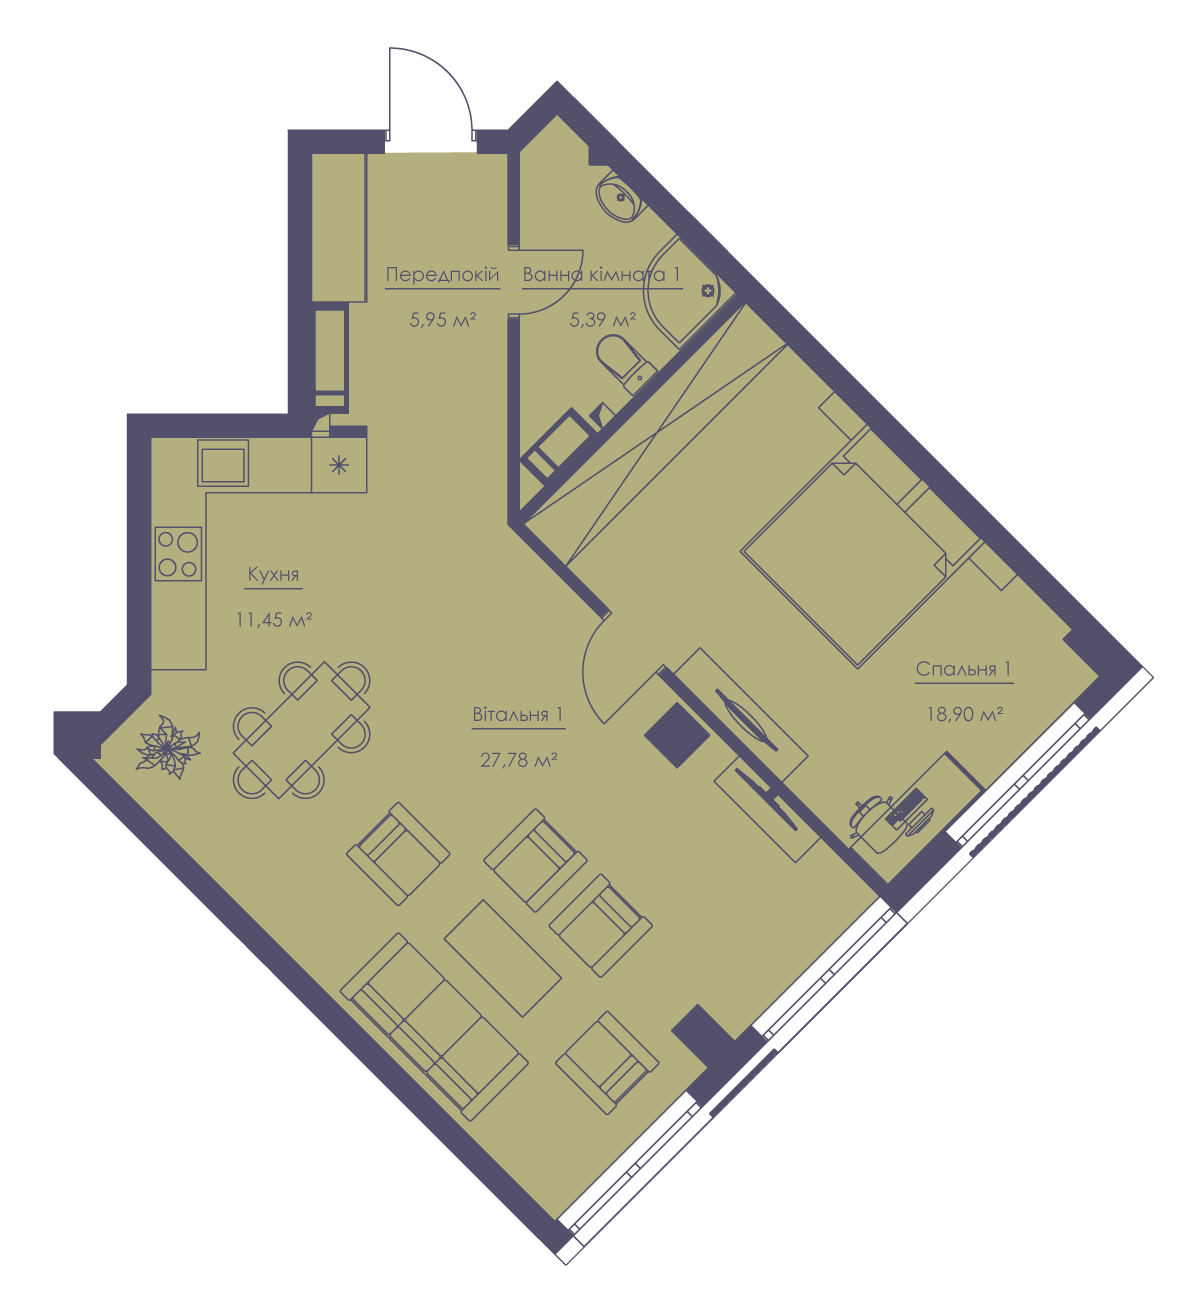 Apartment layout KV_58_2a_1_1_1-1